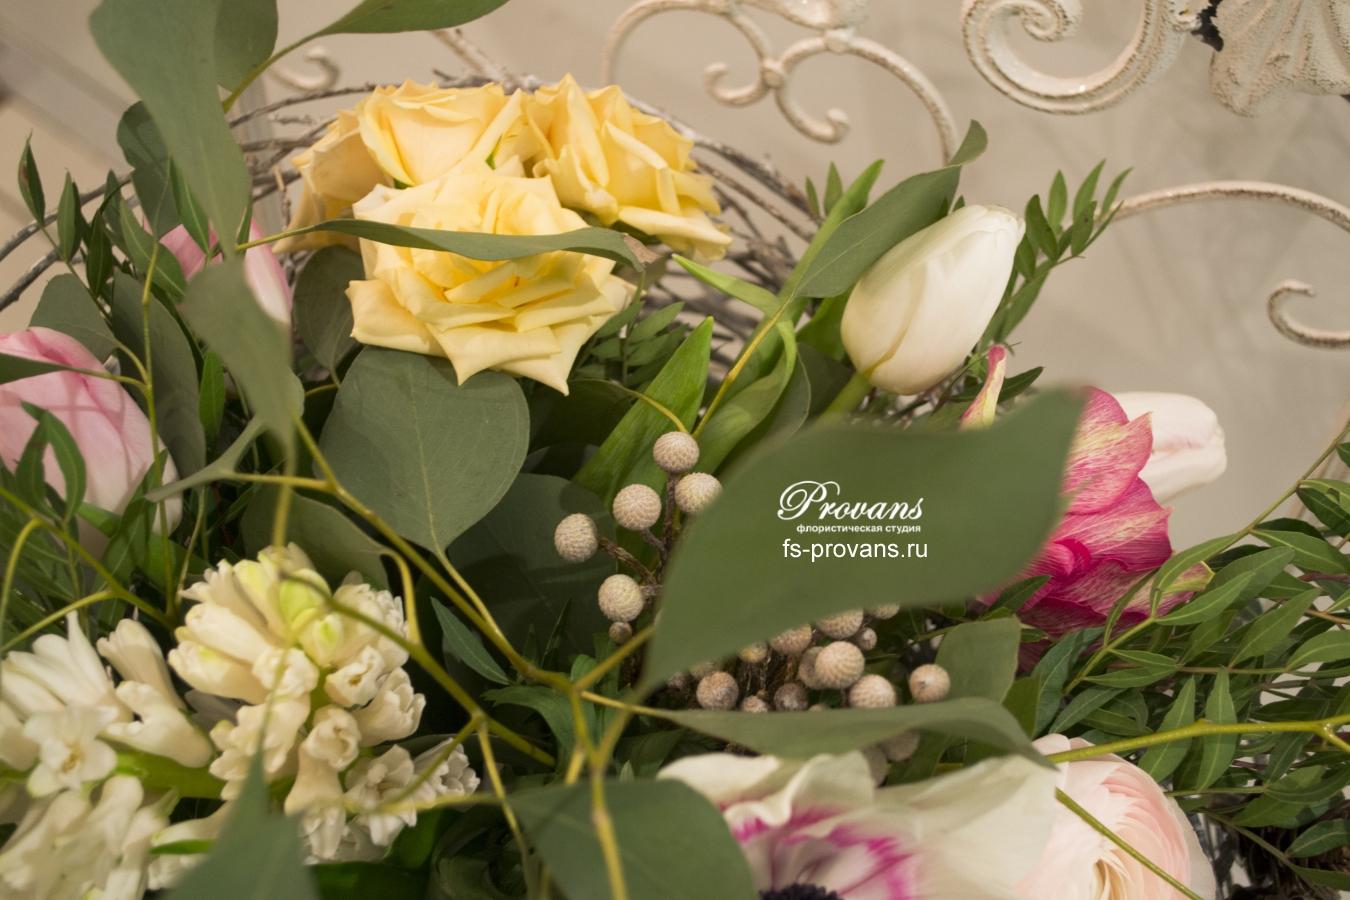 Букет на каркасе. Анемоны, гиацинты, лютики, розы, тюльпаны